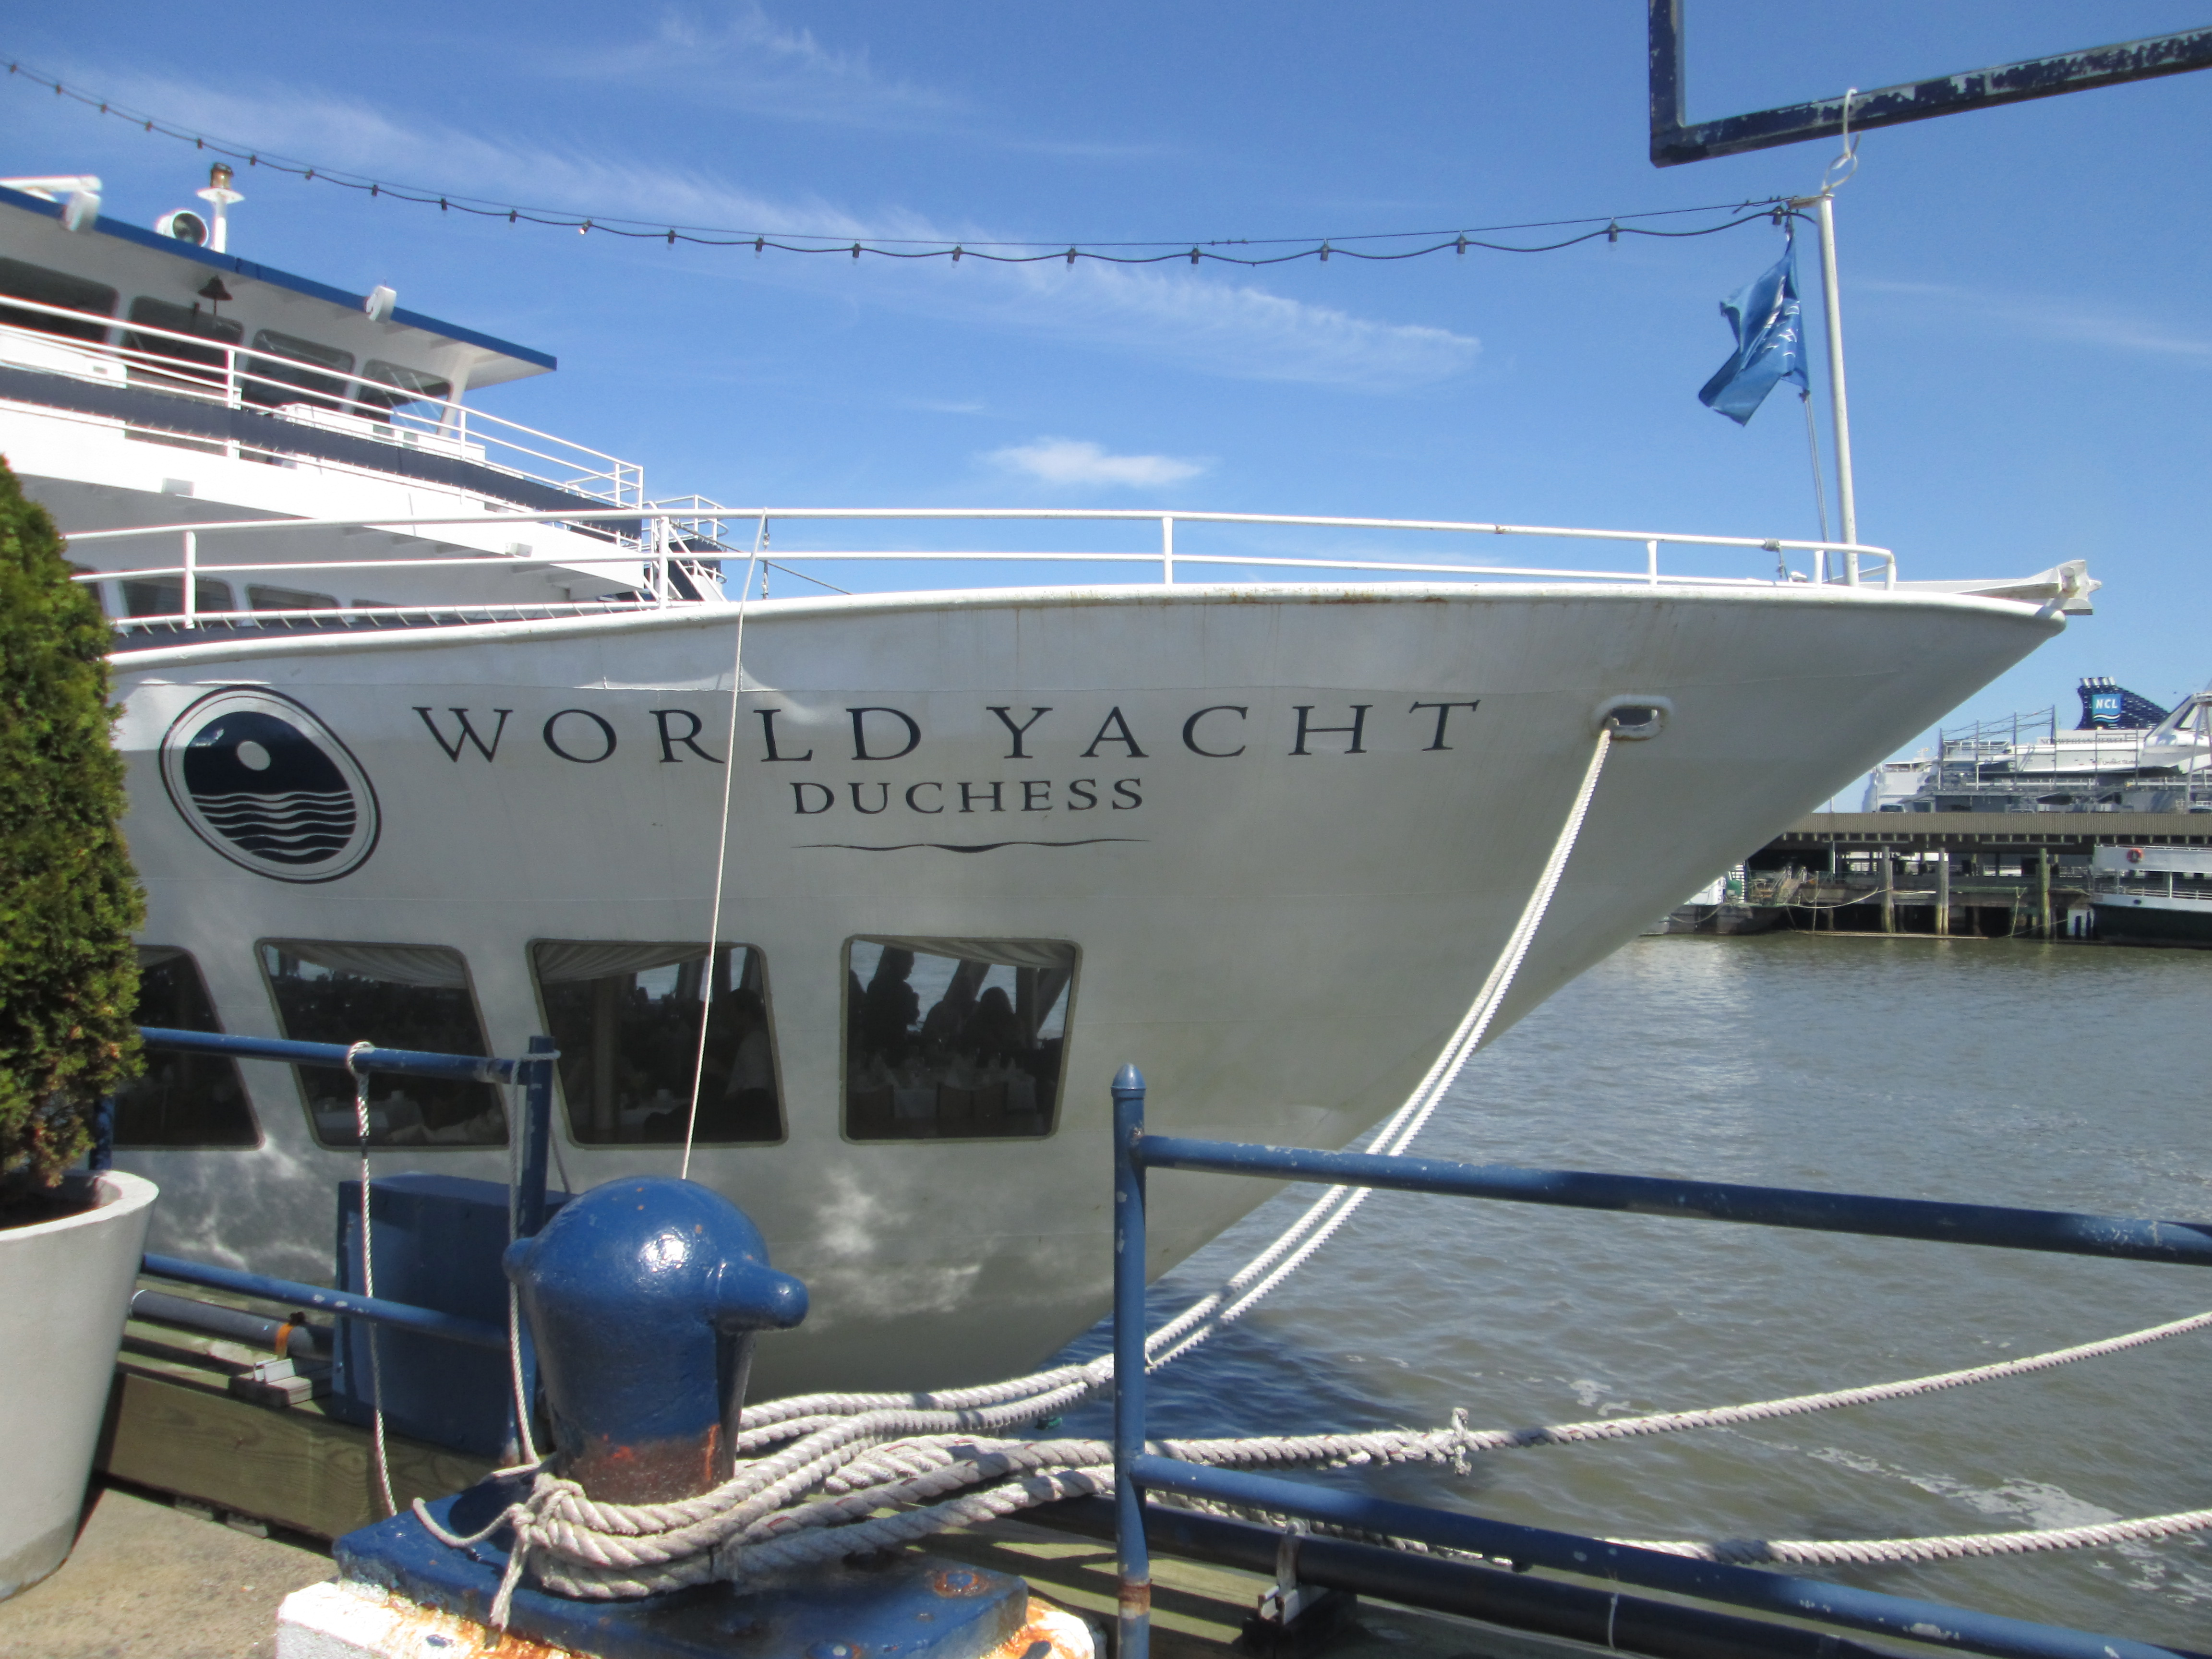 Pier 81 World Yacht Cruises A Girl Travels